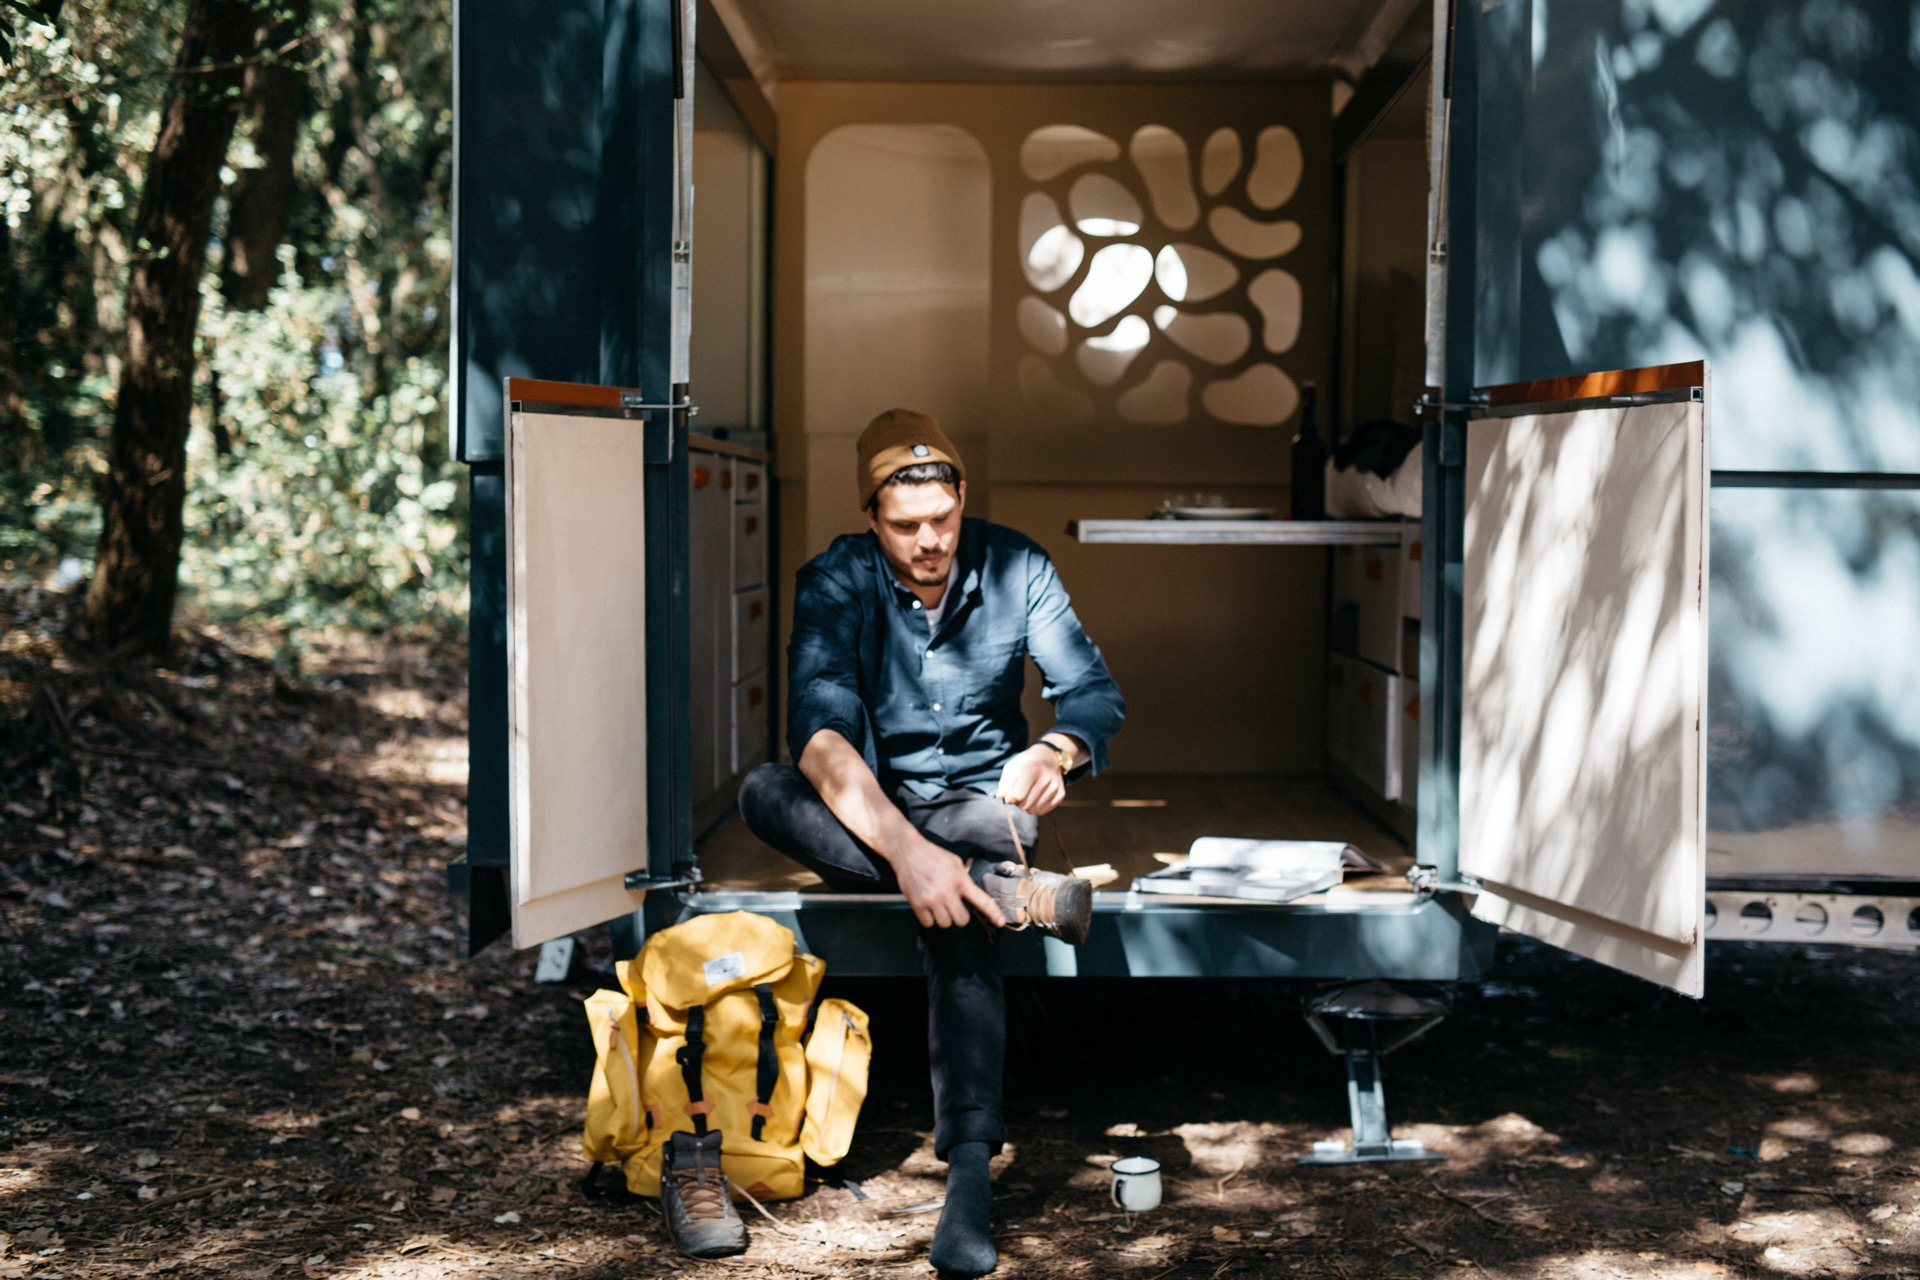 Camper and caravan pitch